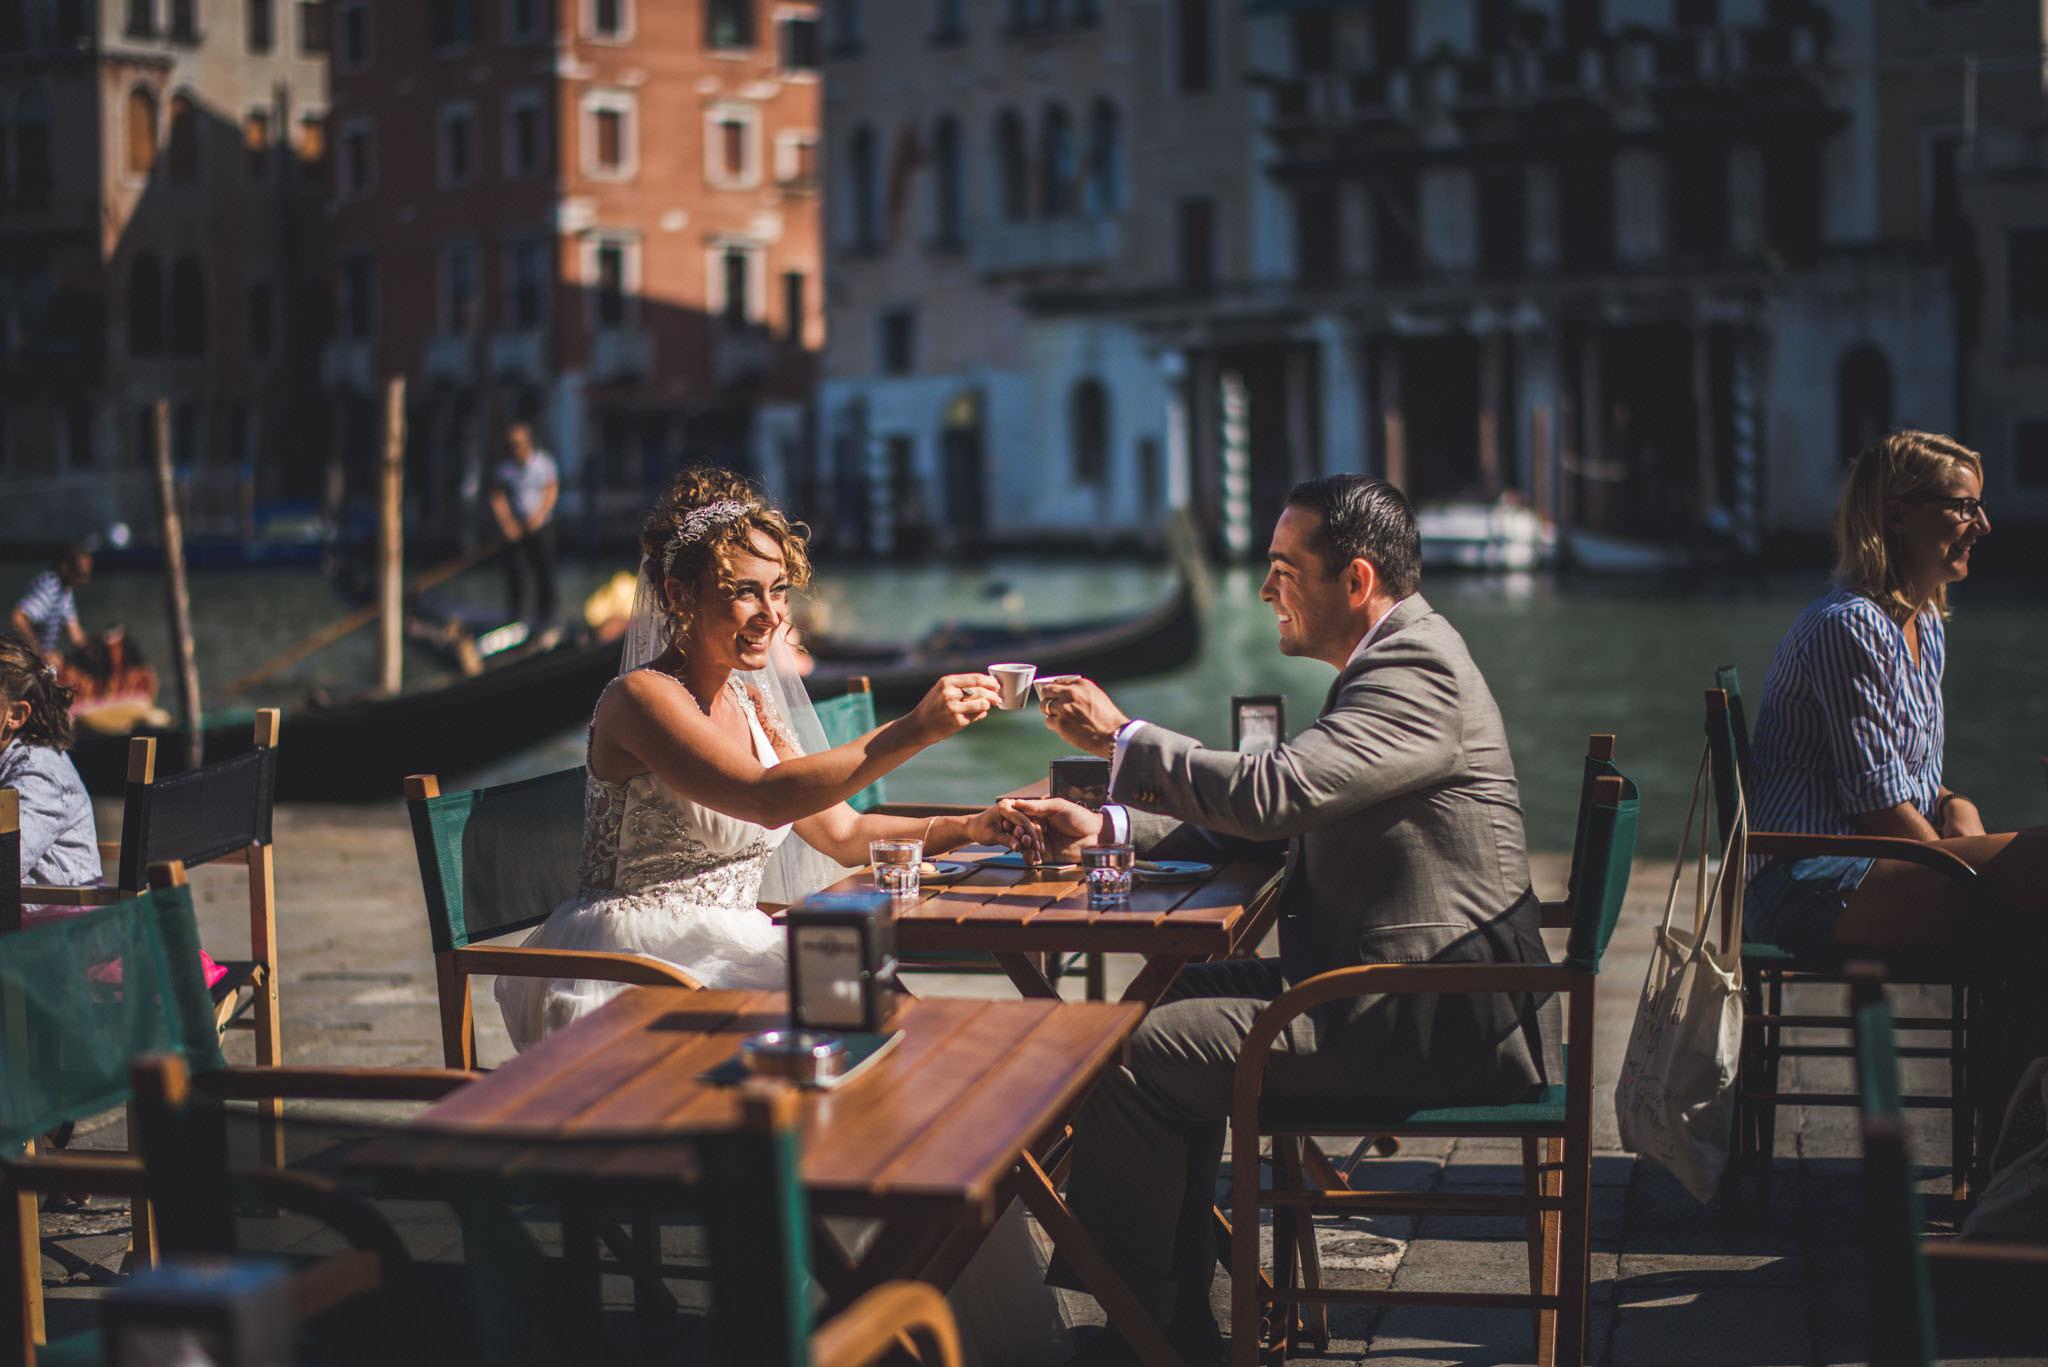 wedding-in-venice-roberto-panciatici-photography-75